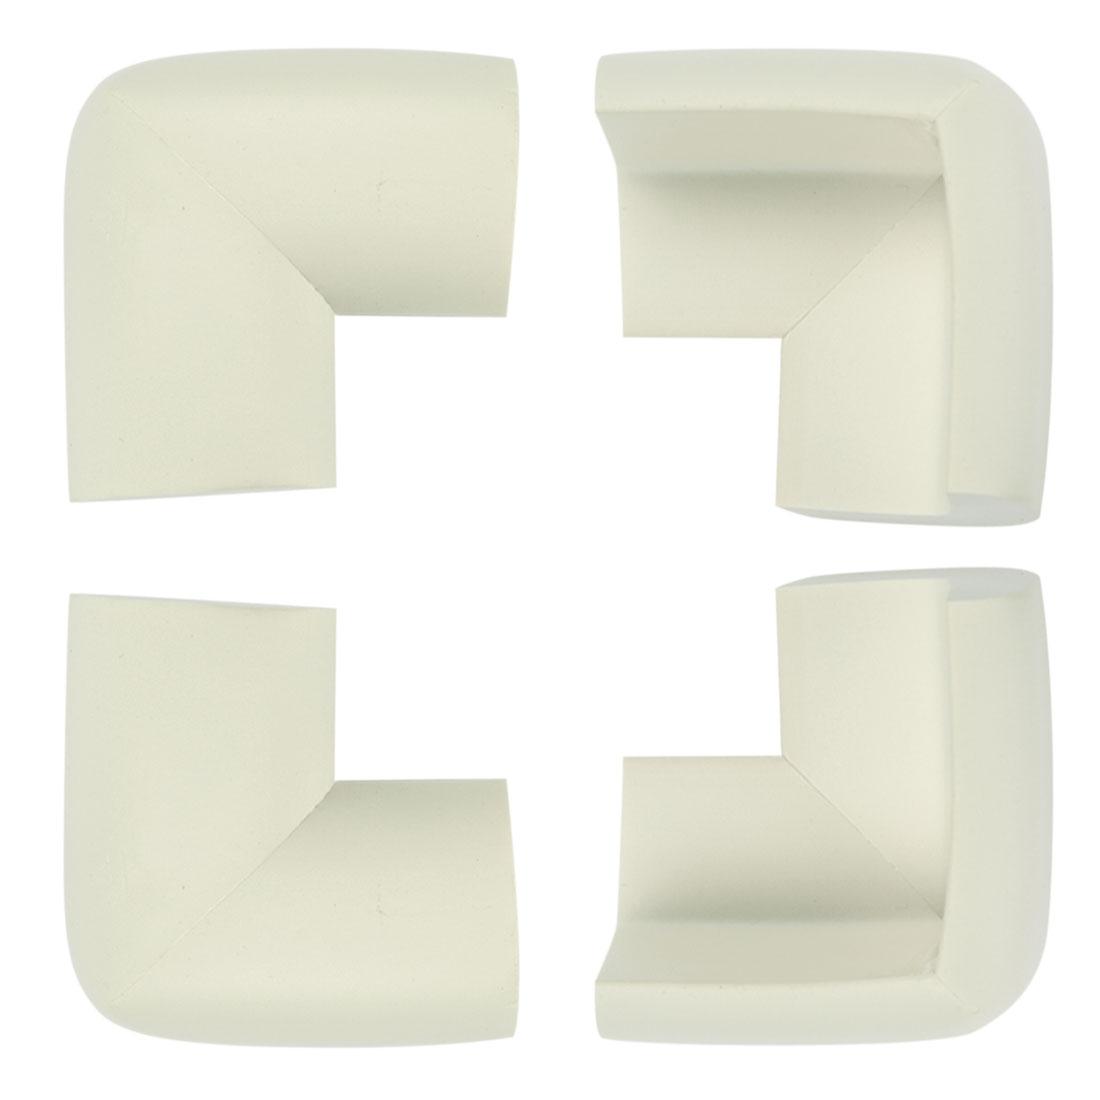 4pcs White Desk Edge Foam Corner Cushion Guard Strip Soft Bumper Protector